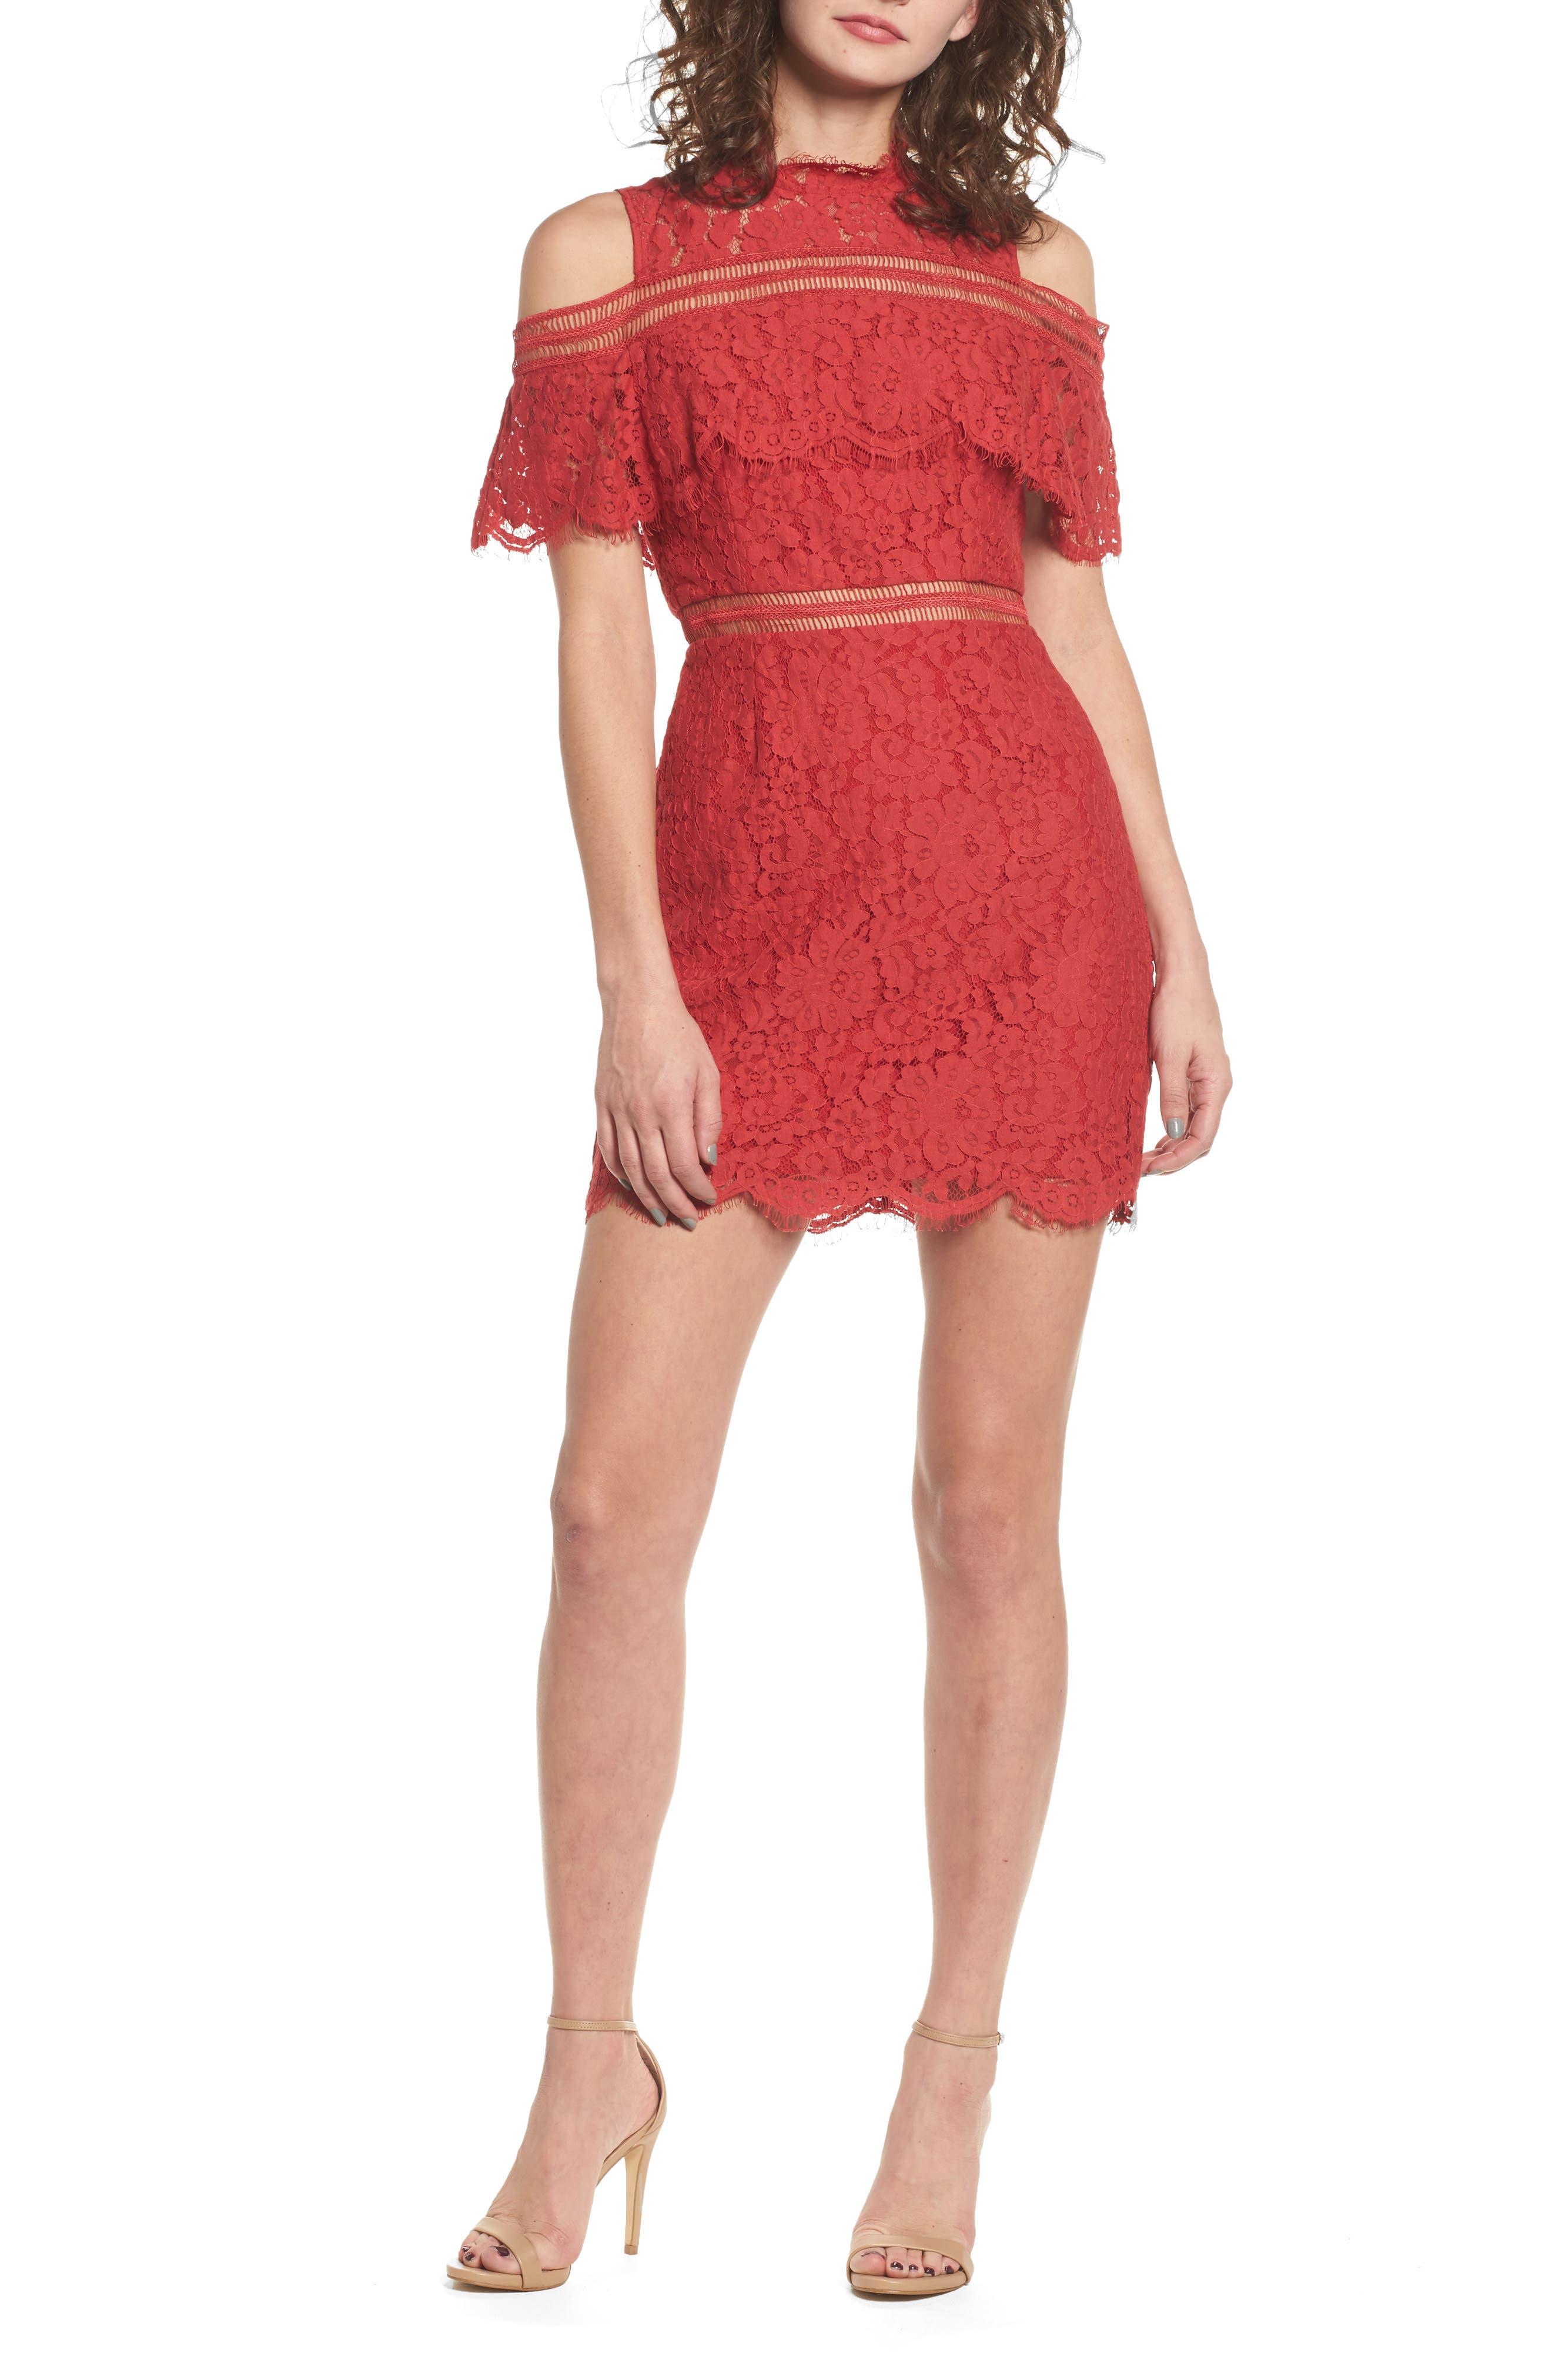 Alternate Image 1 Selected - Keepsake the Label Butterfly Lace Cold Shoulder Dress